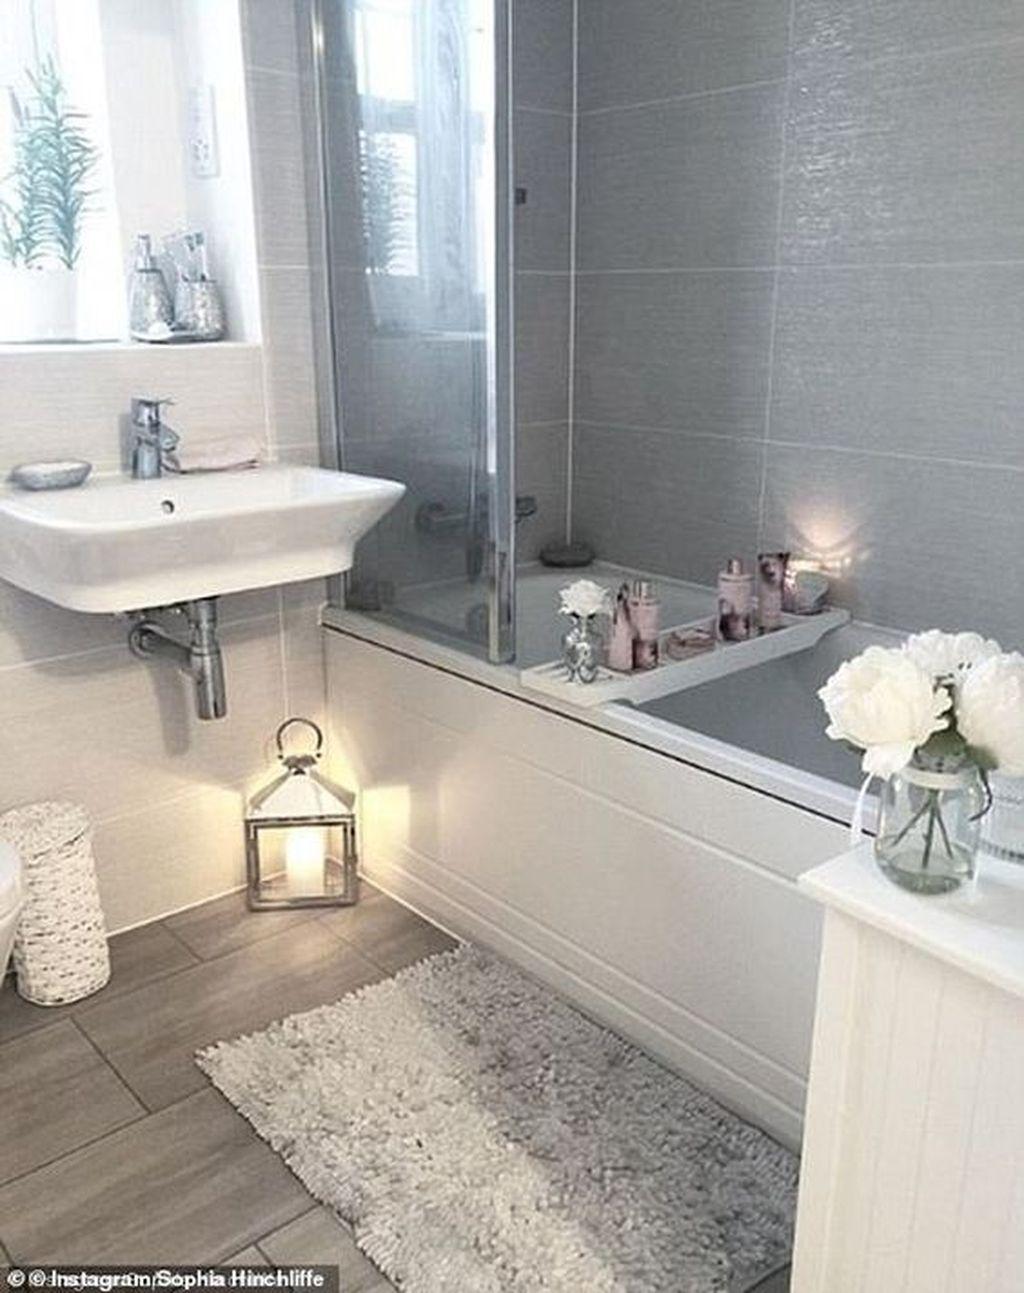 Bathroom Interior Design, Classy Bathroom Decor